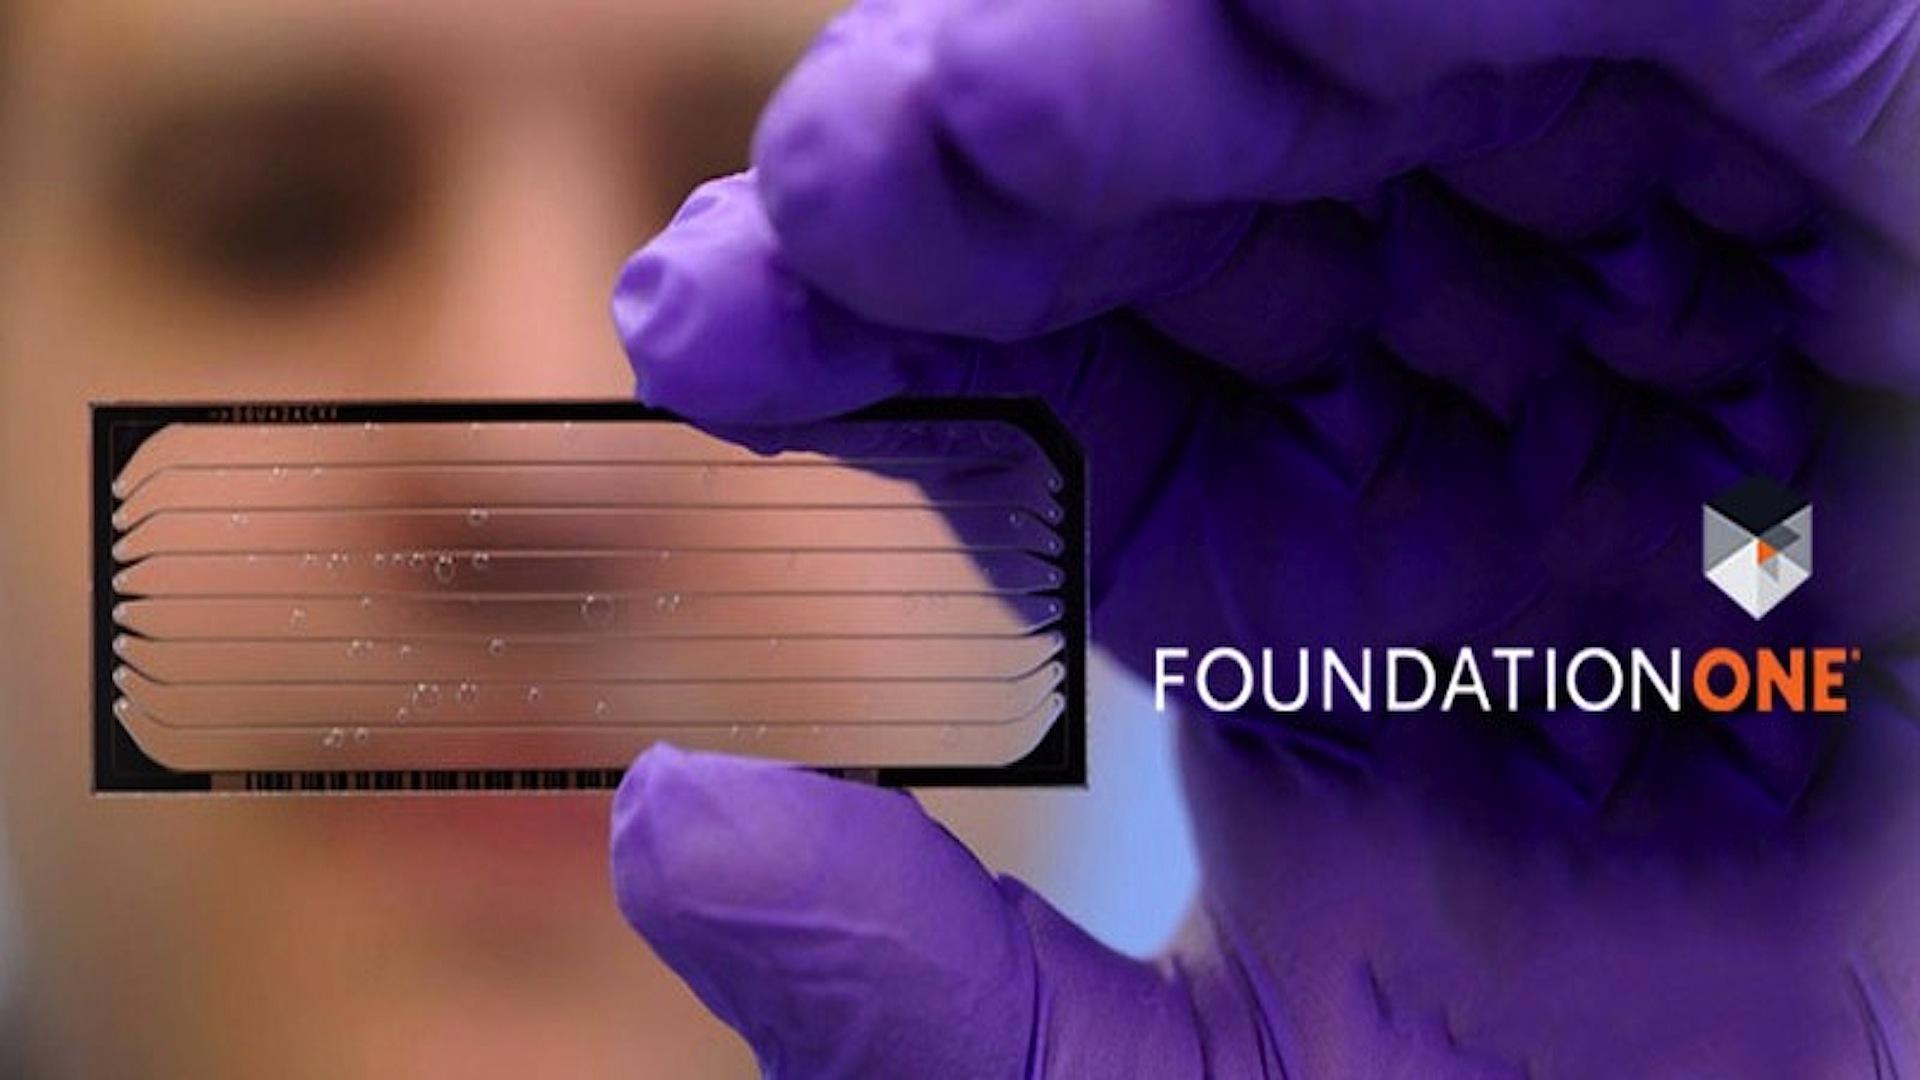 foundationone